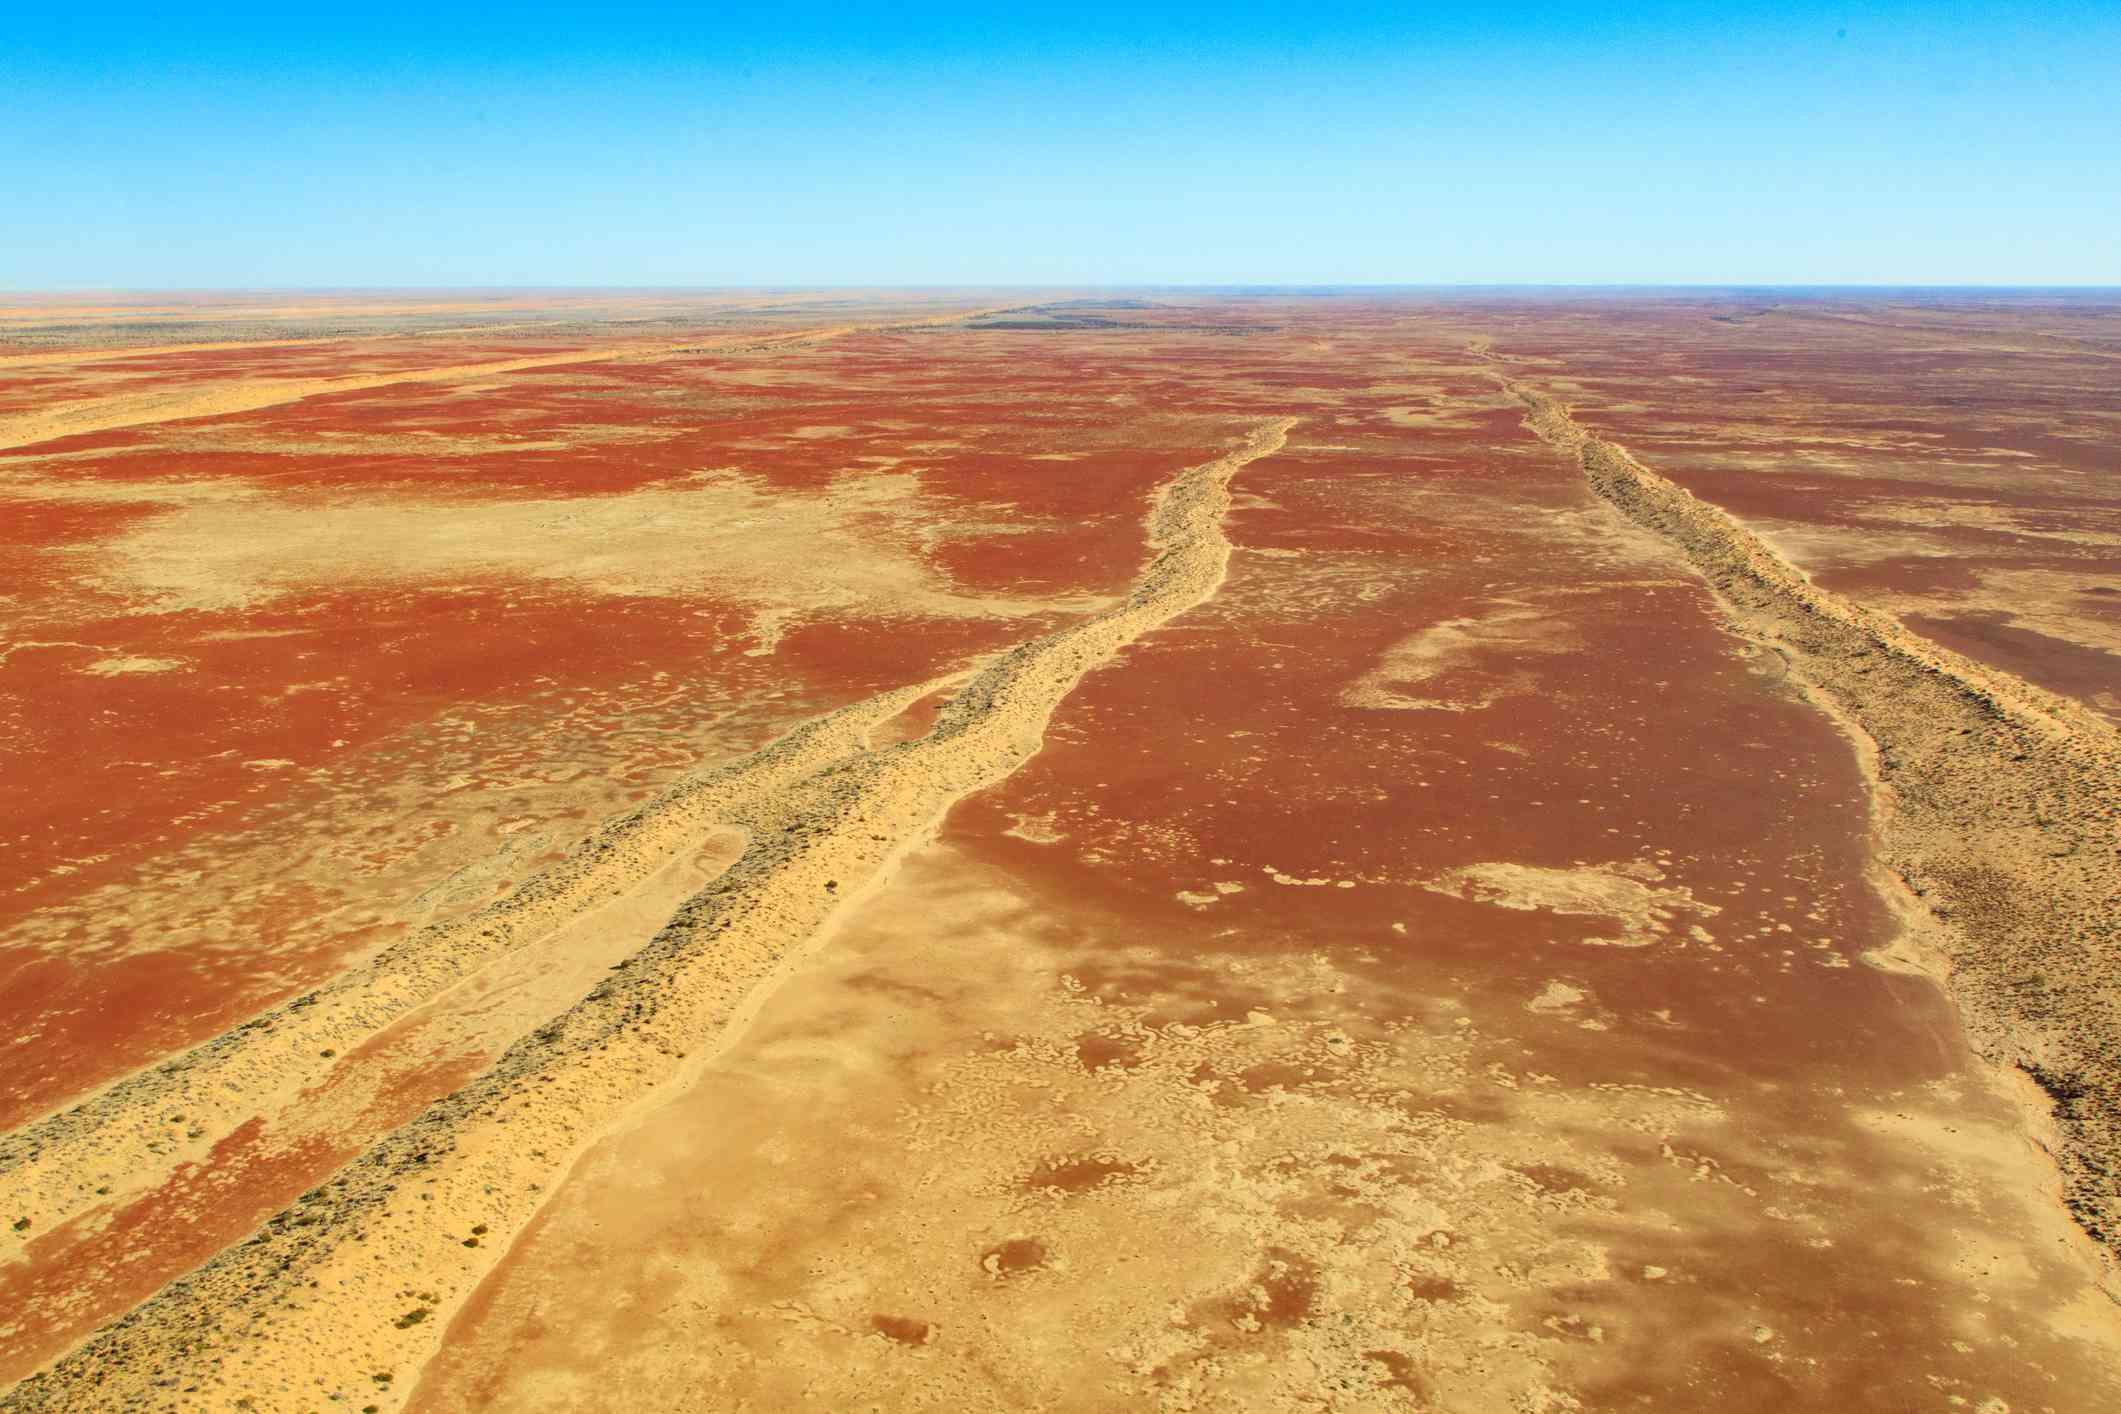 A desert in Queensland Australia against a blue sky.